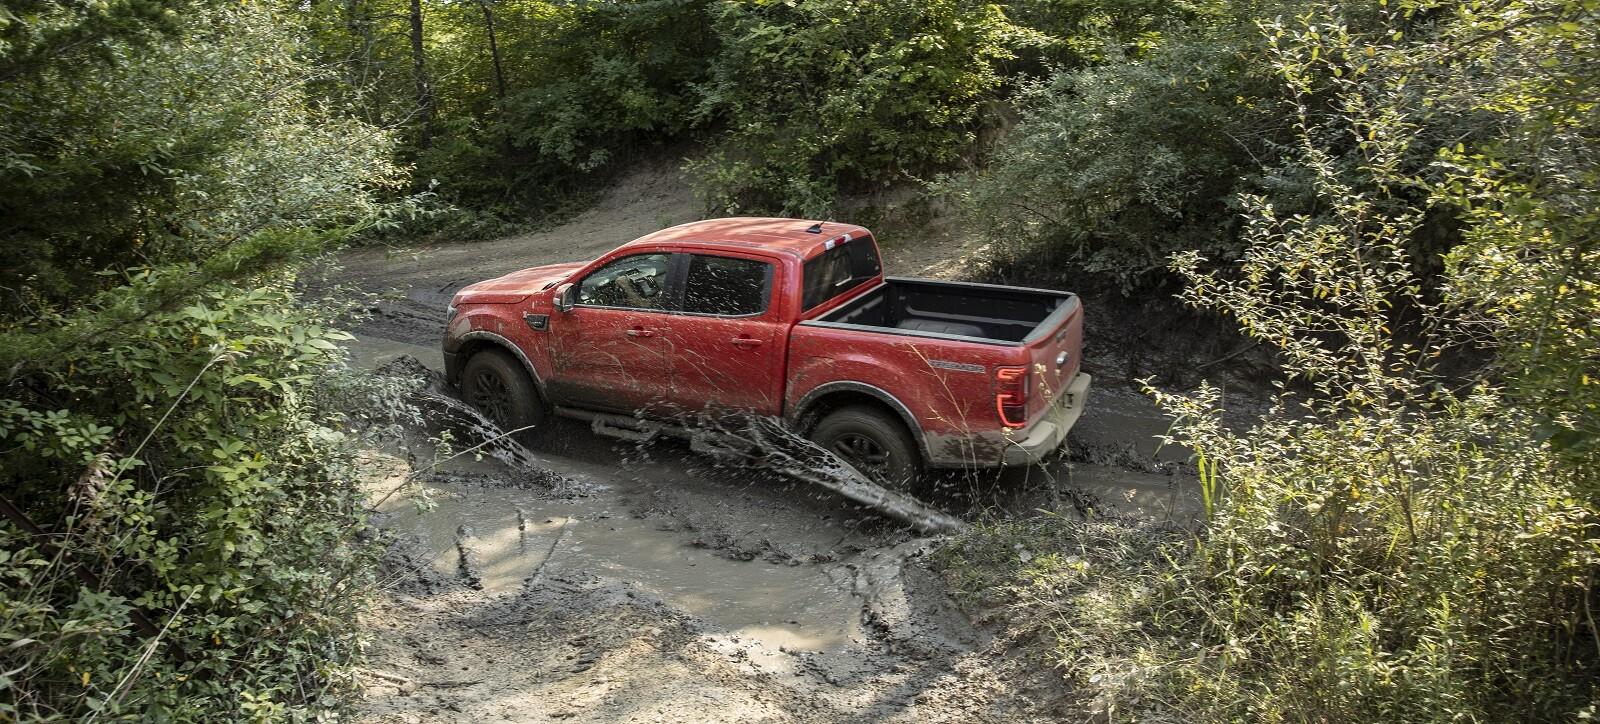 Foto de Ford Ranger Tremor Off-Road (16/28)